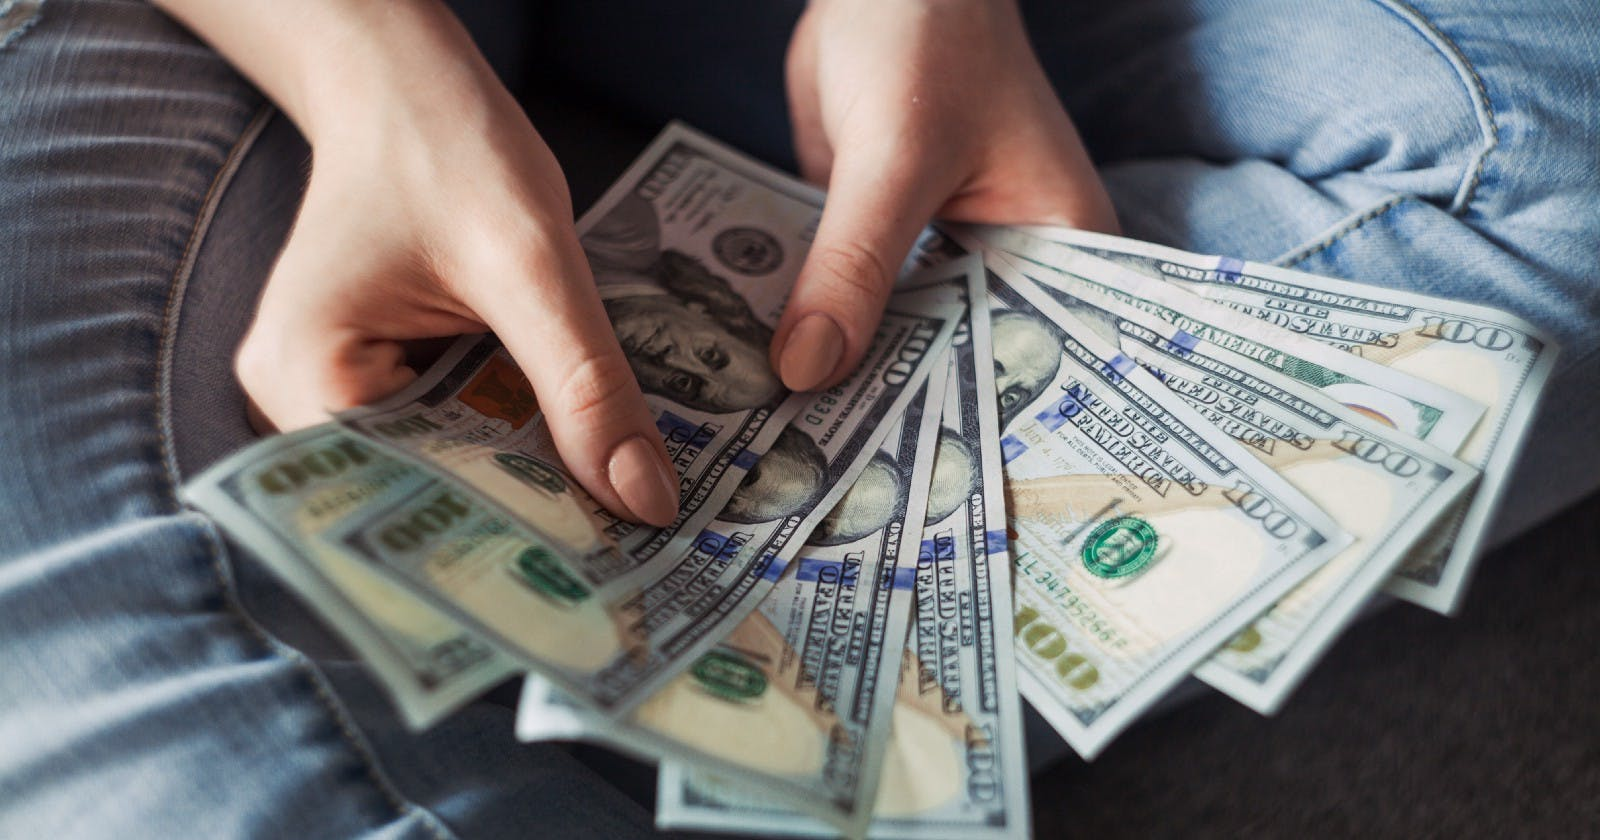 6 Different Ways I Make Money as a Software Developer - You CanToo